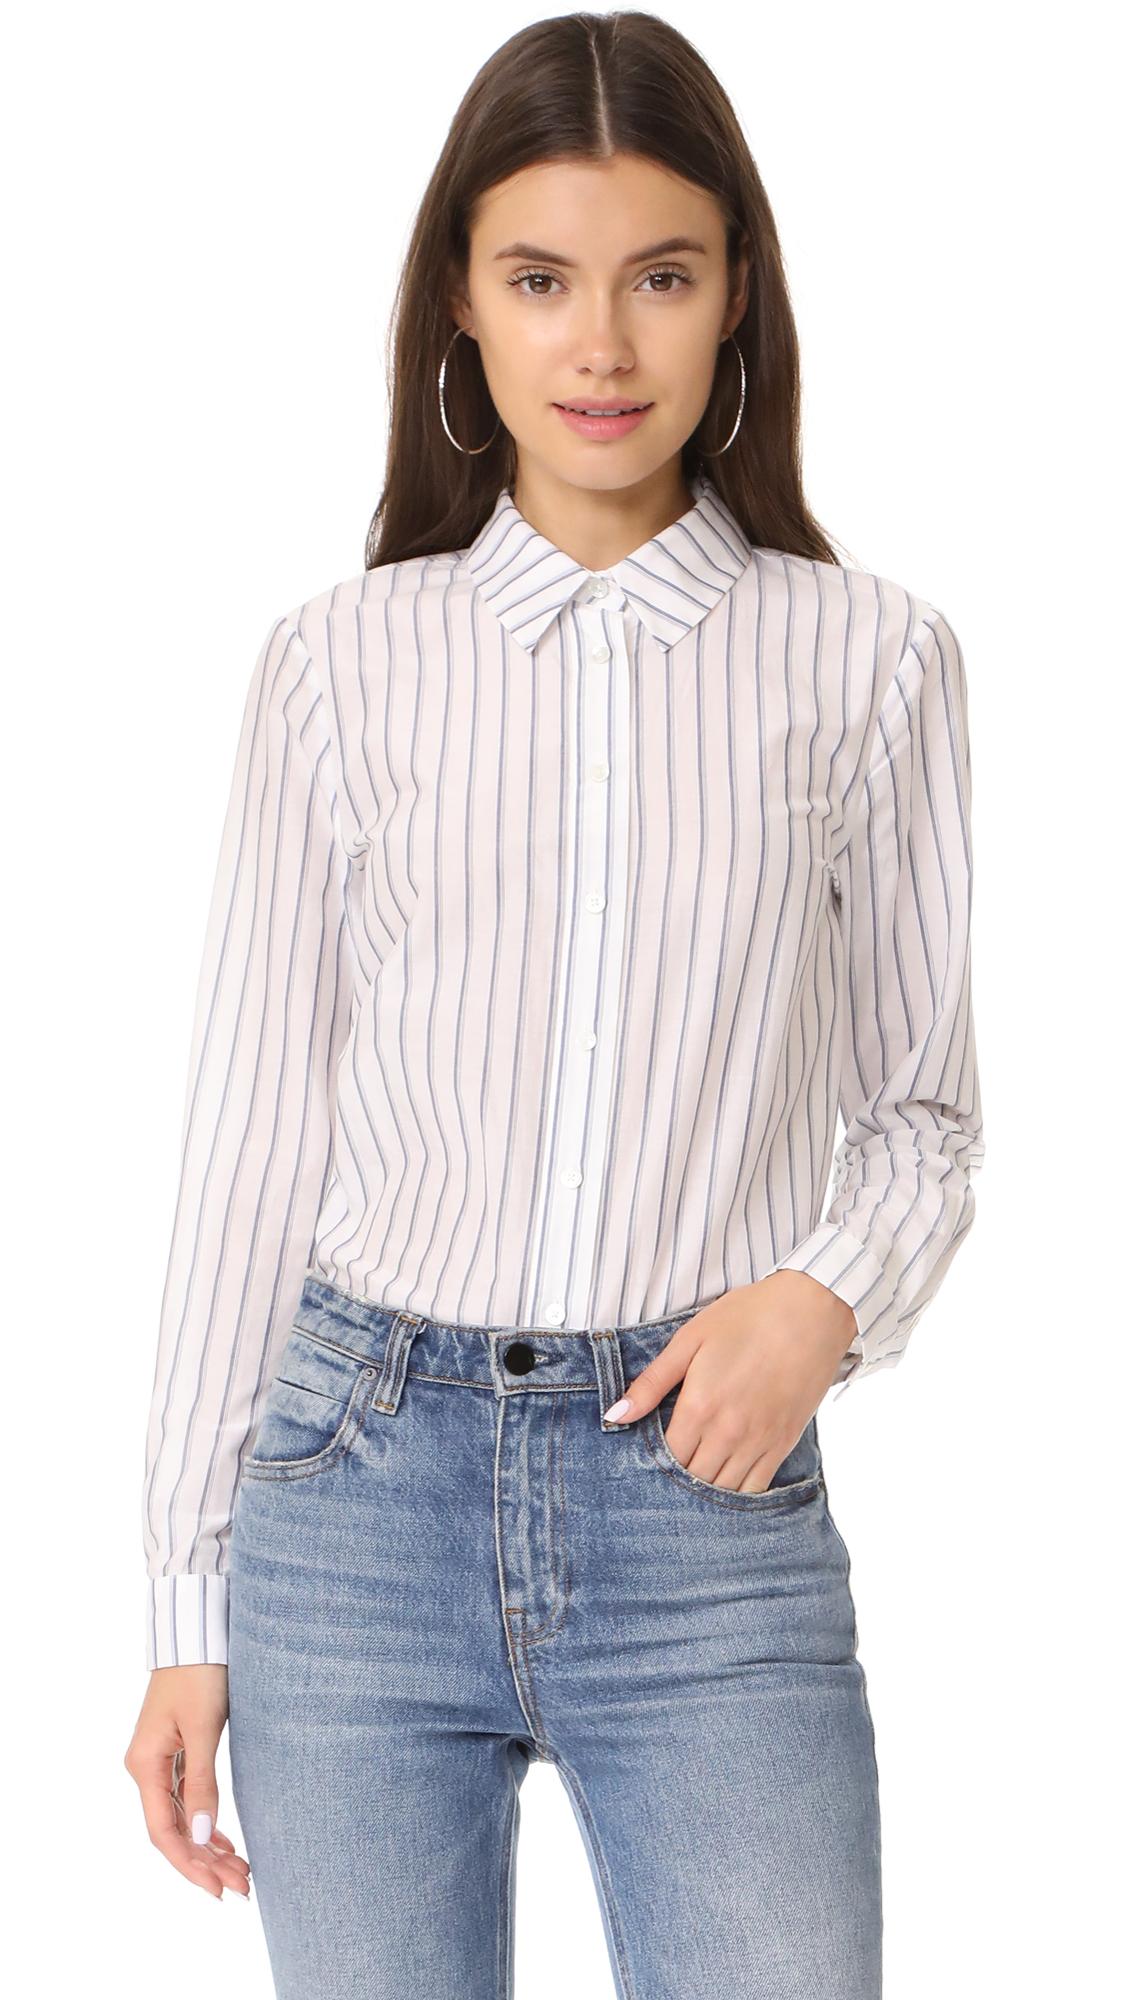 Jenni Kayne Boyfriend Shirt - Ivory/Blue